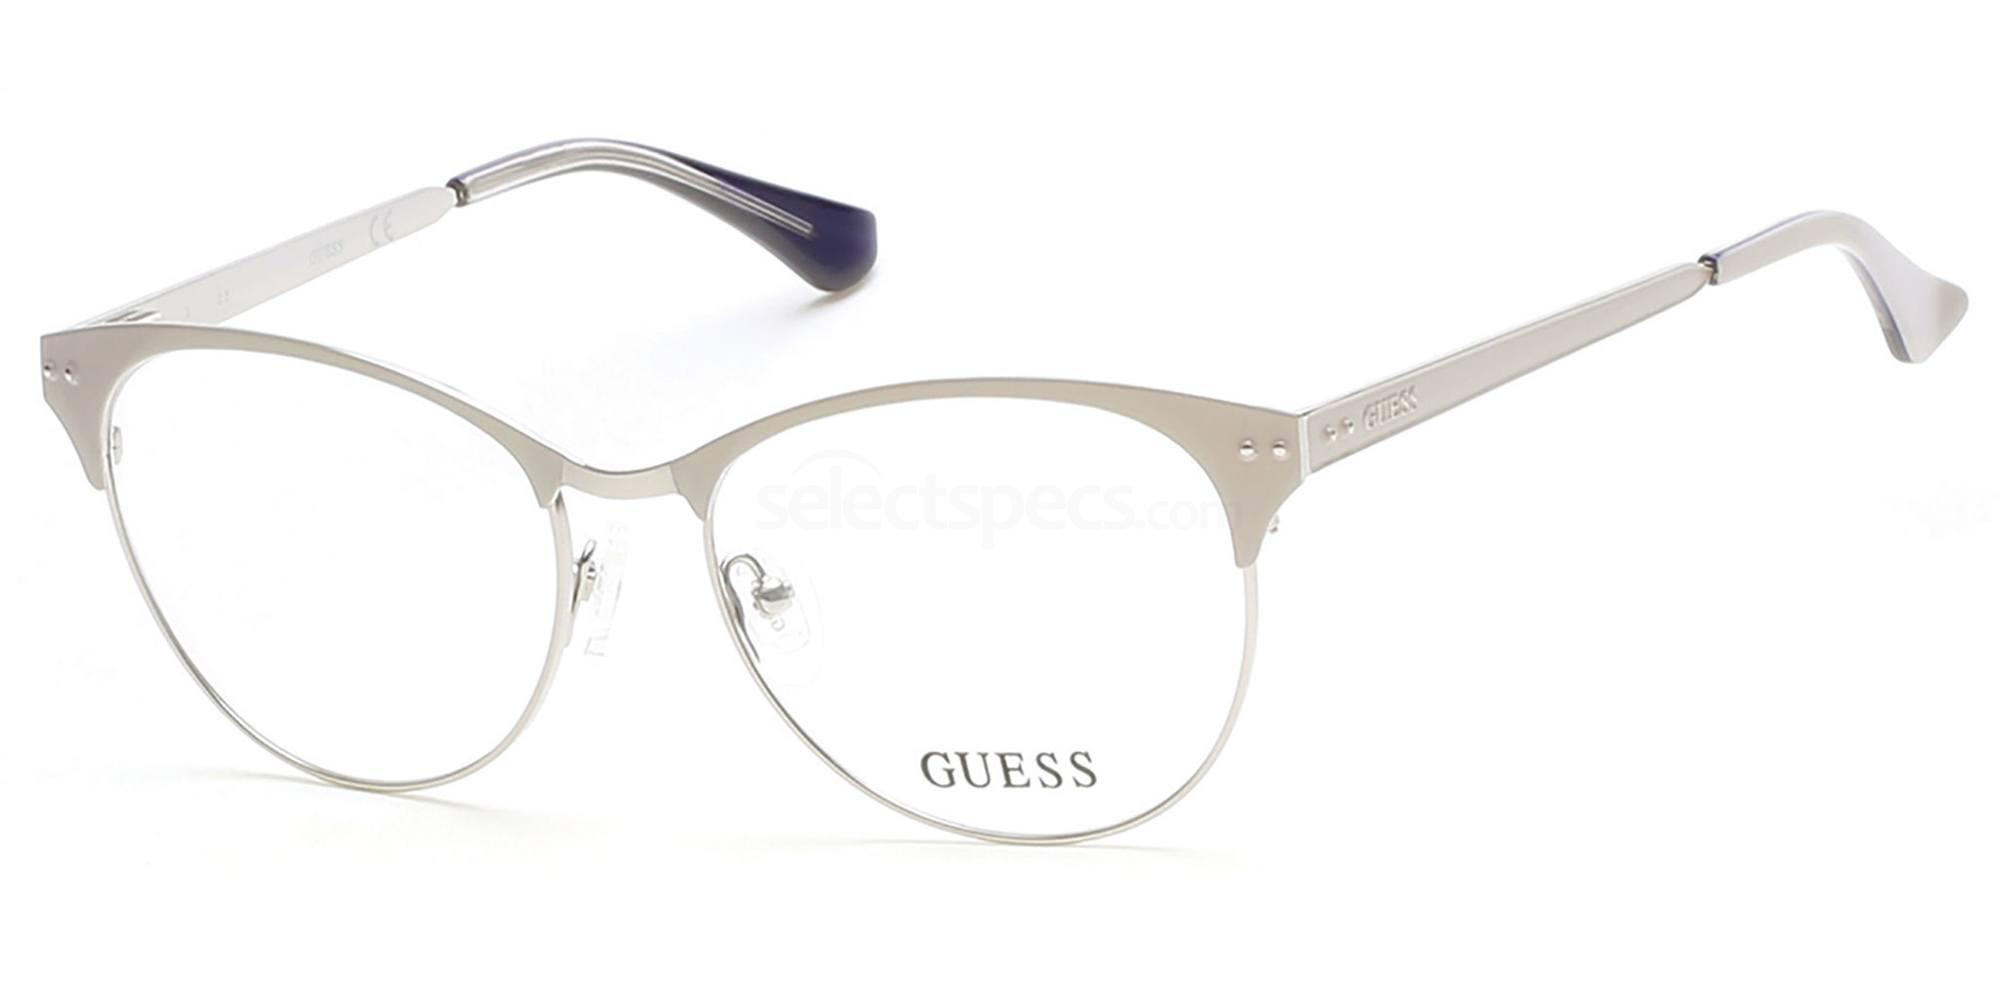 025 GU2551 Glasses, Guess